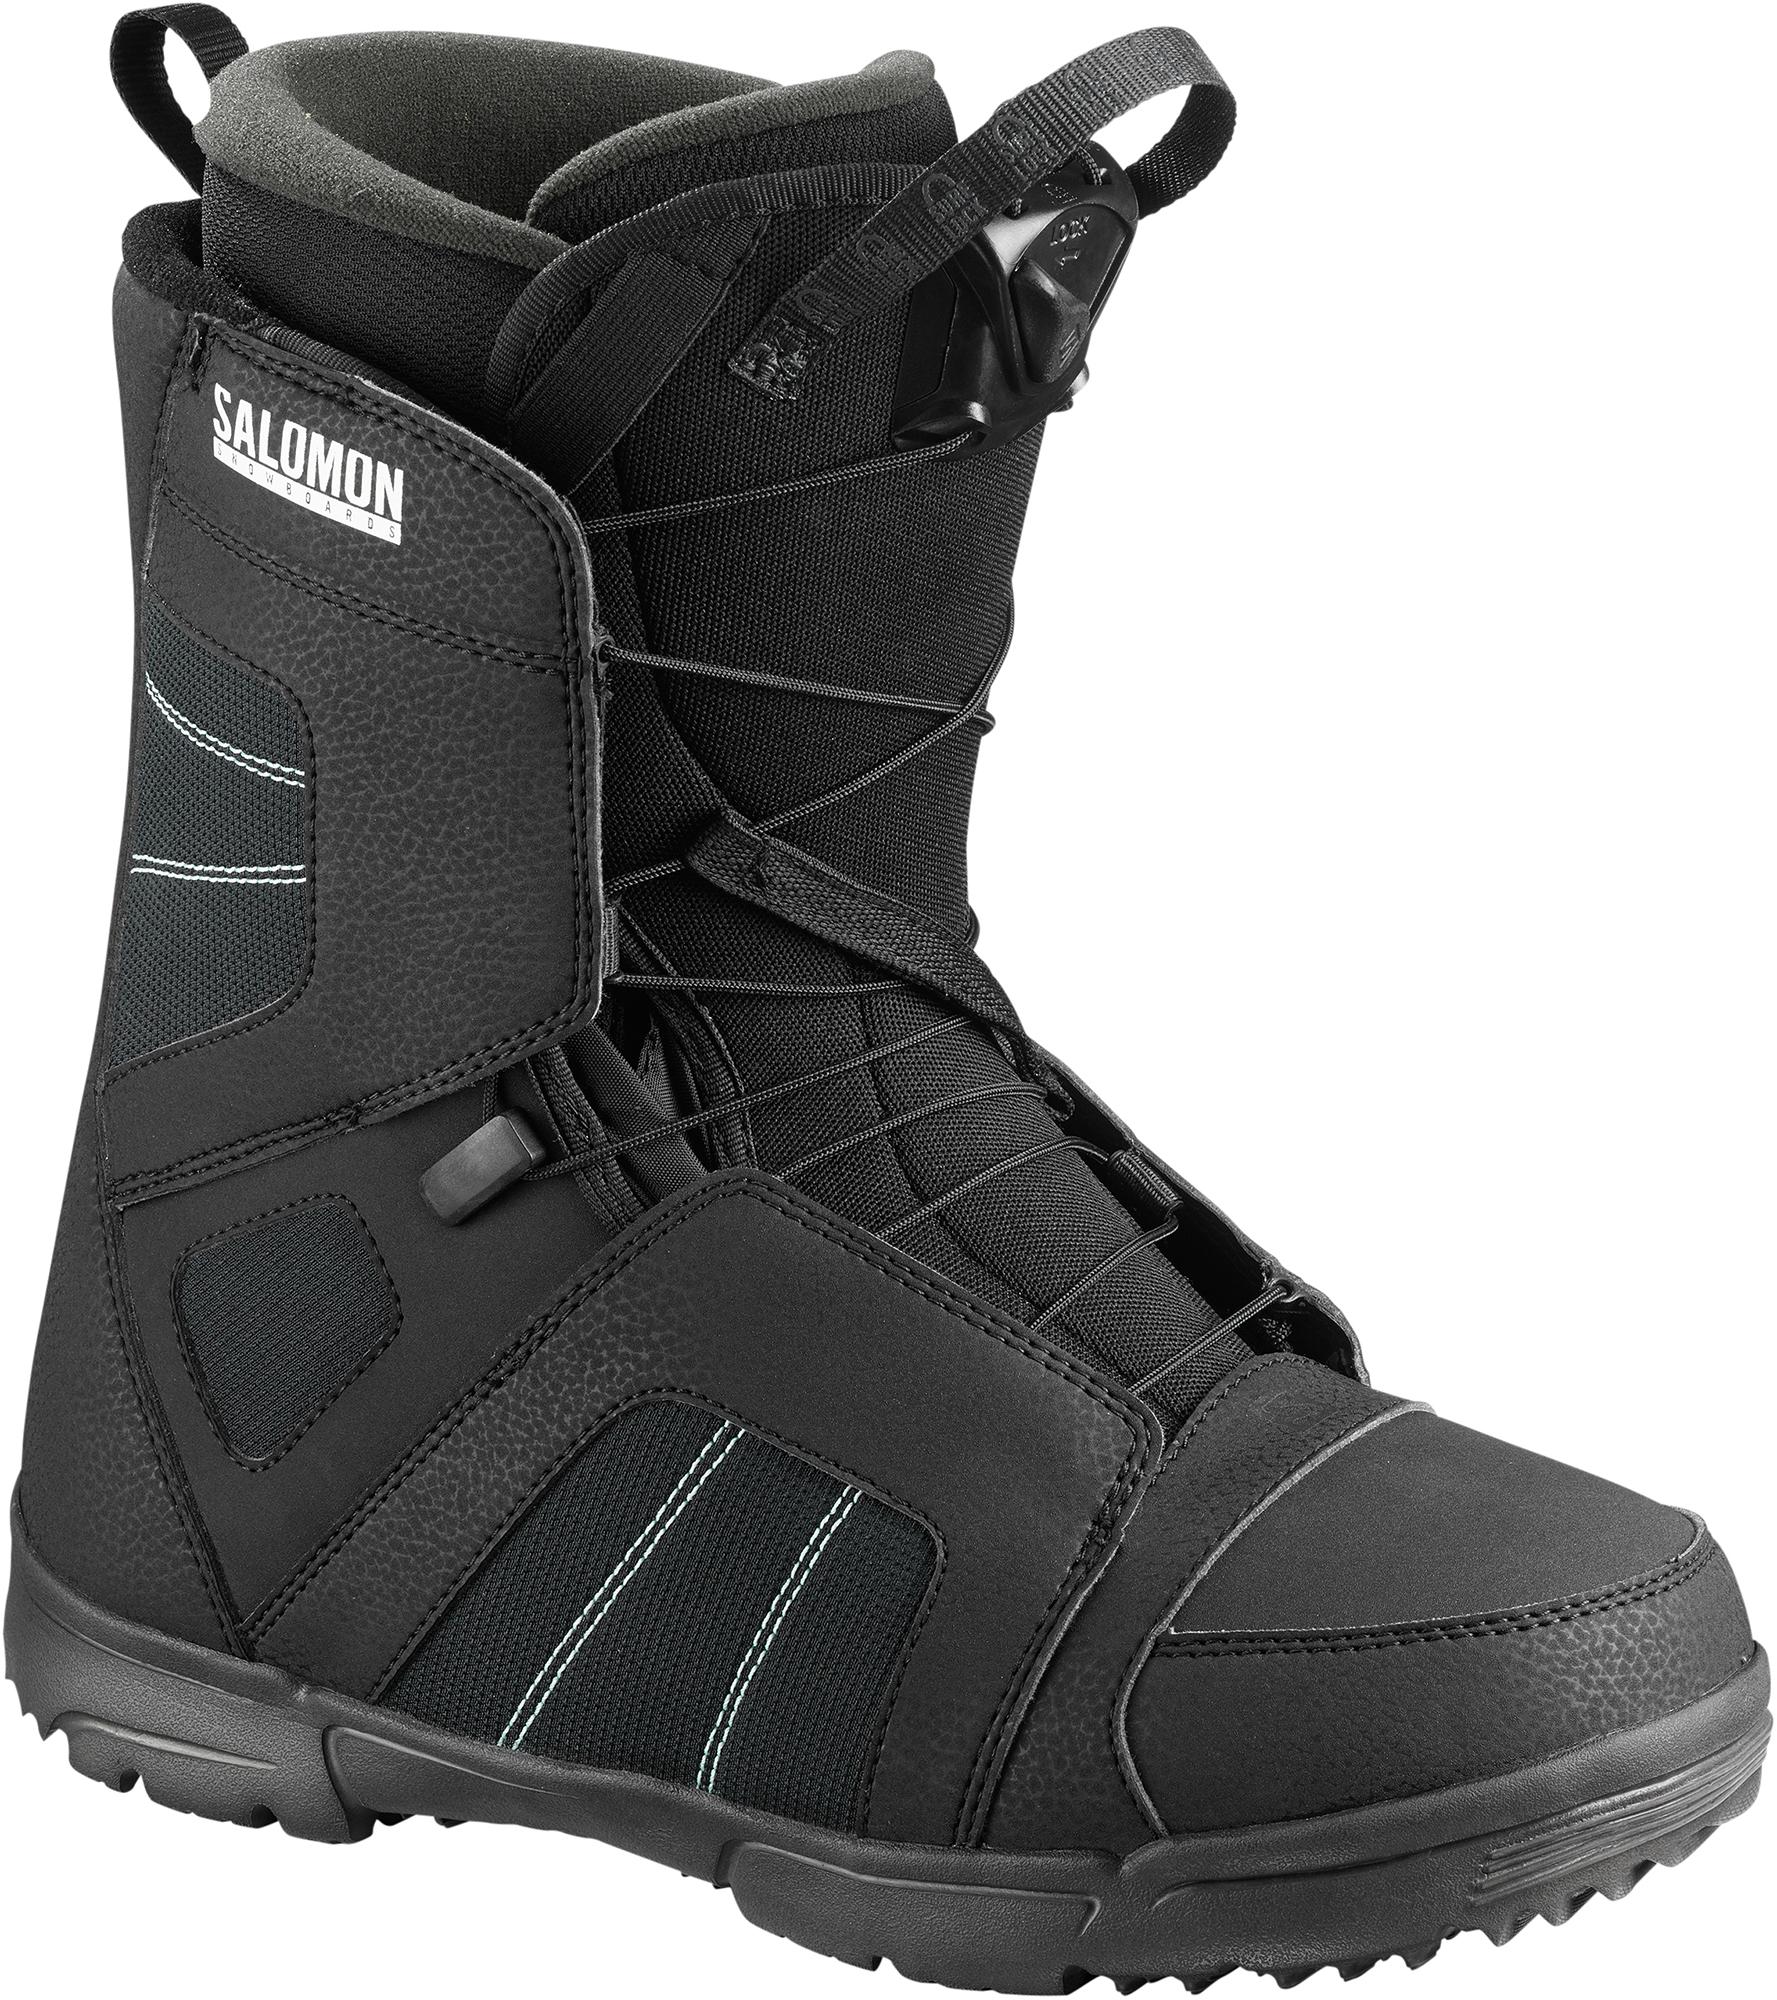 Salomon Сноубордические ботинки Salomon Titan, размер 43,5